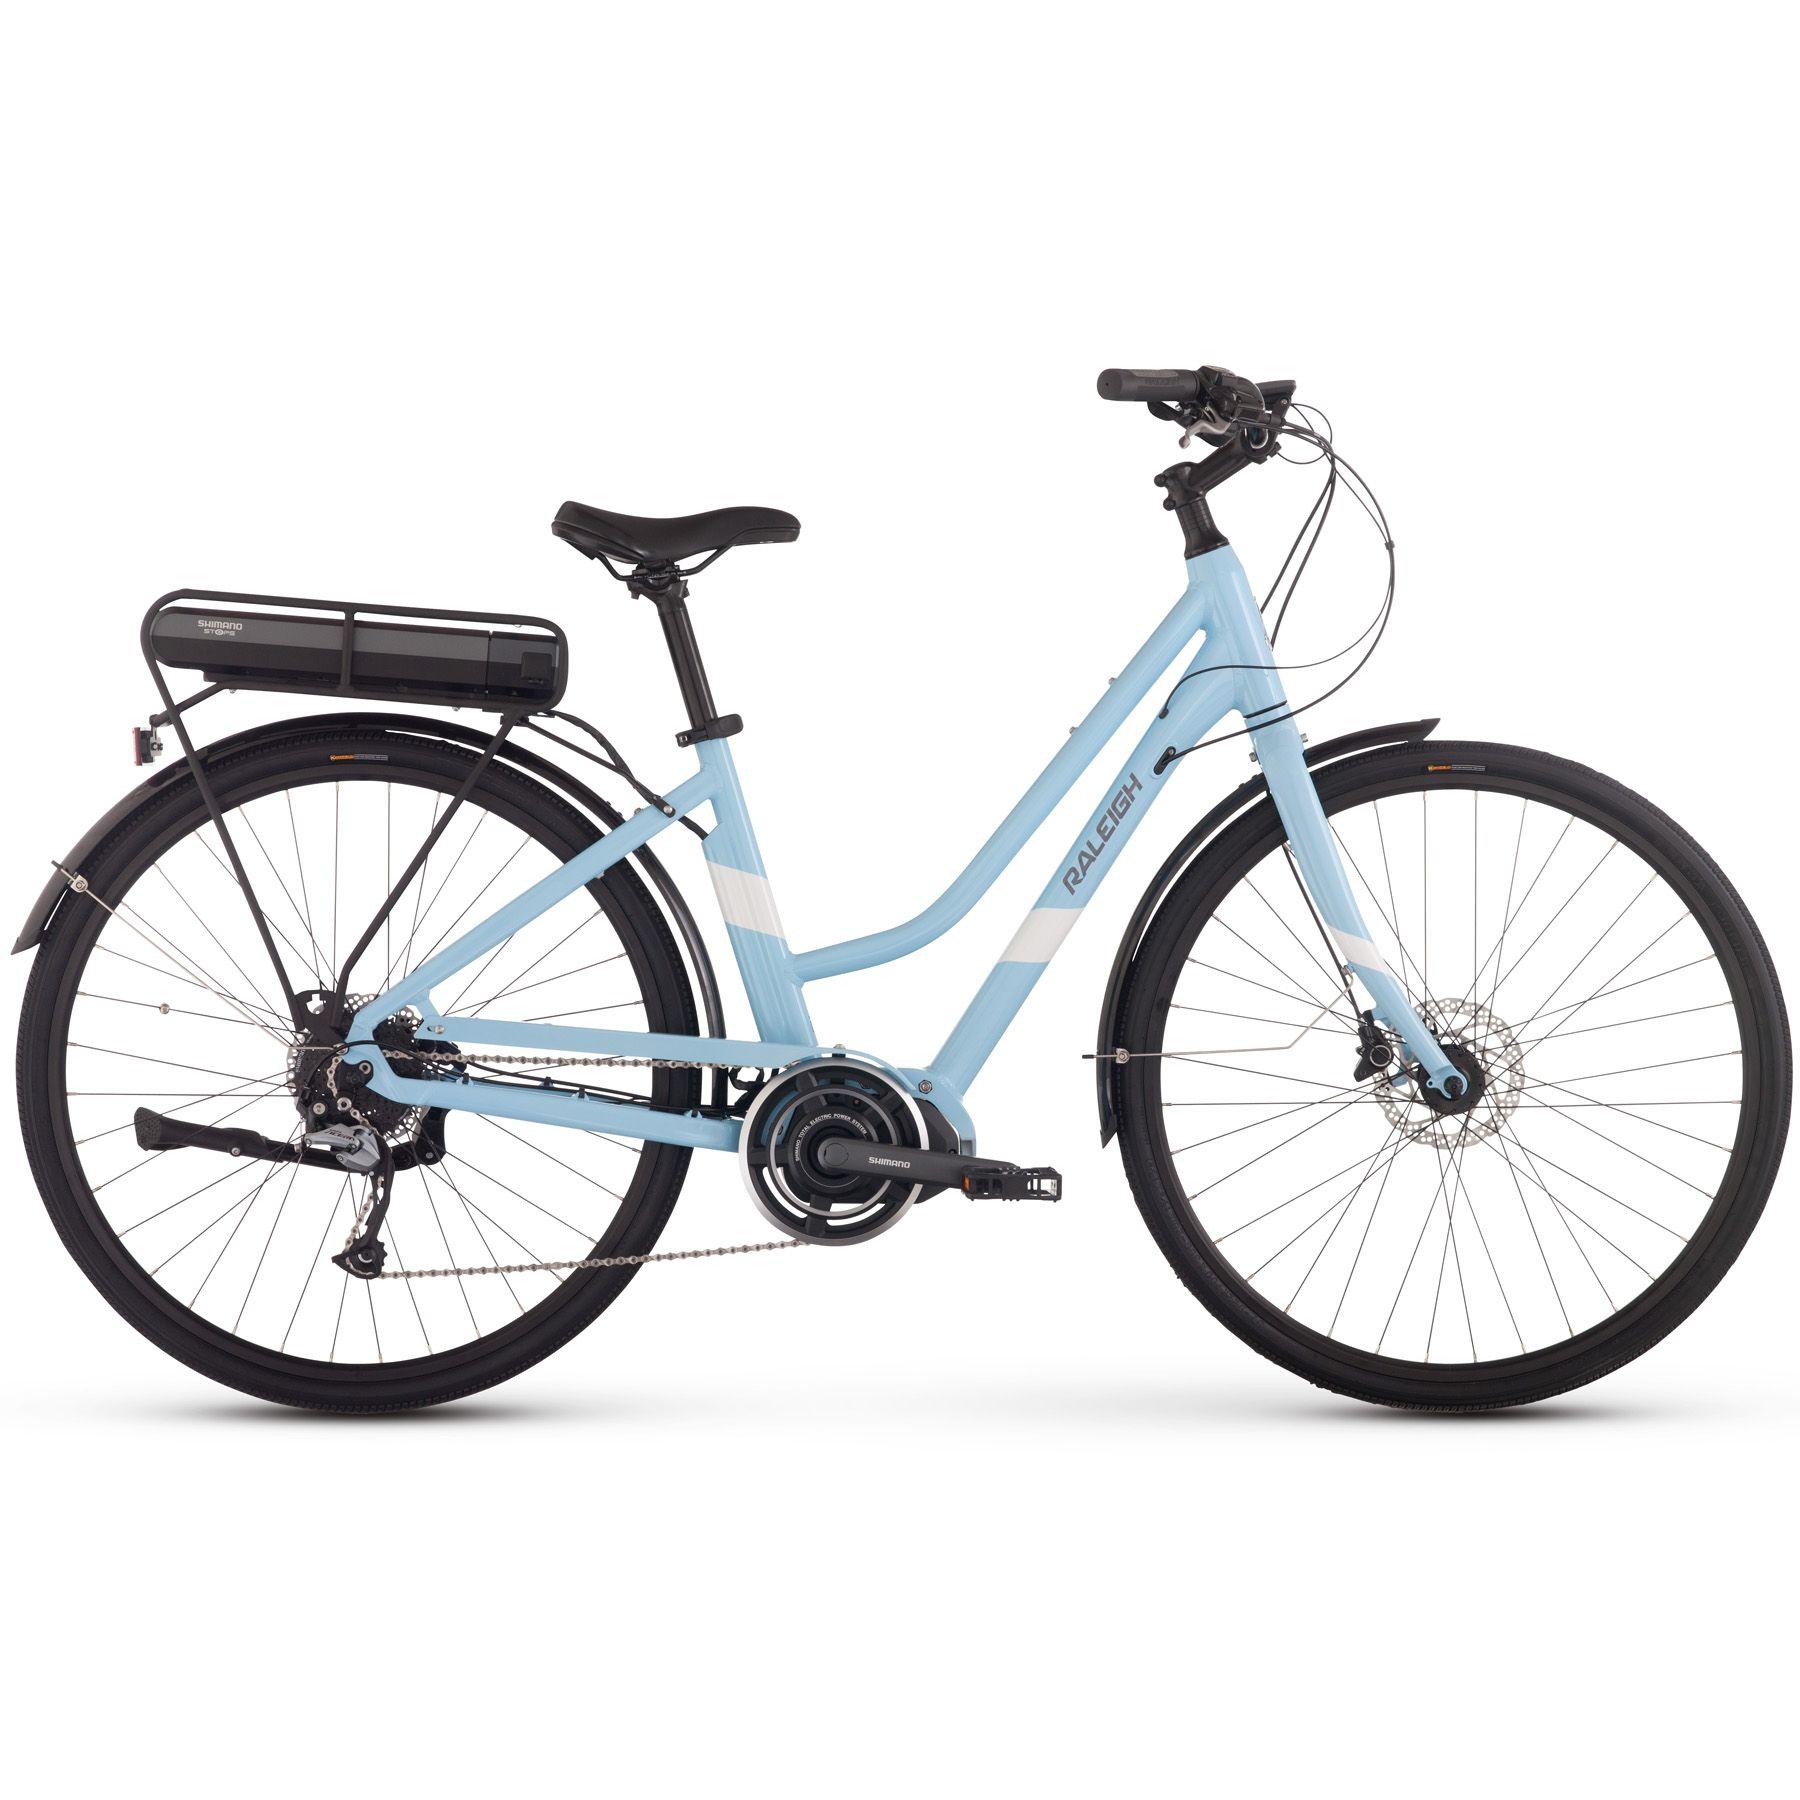 Raleigh 2017 Detour Ie Women S Electric Bike Image Bikes Pinterest